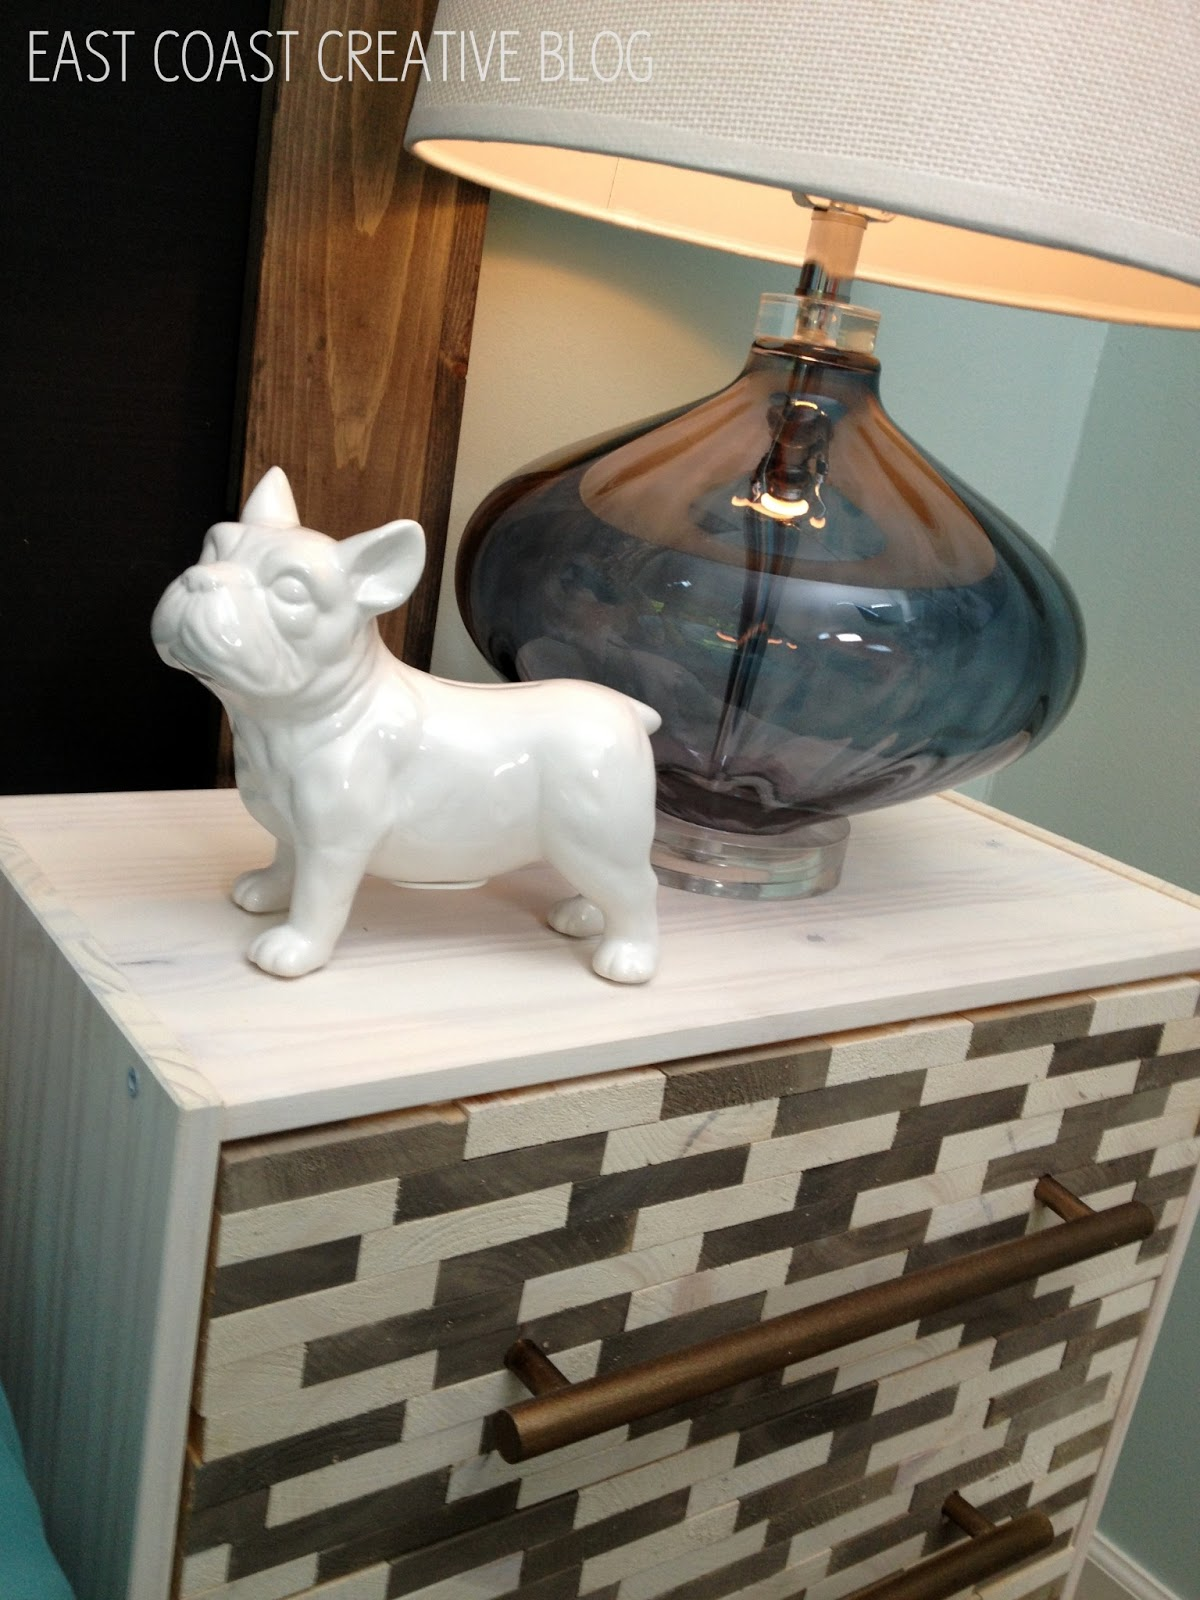 Diy Knock Off Shelves: Wood-Tiled Nightstands {Knock It Off DIY Project}